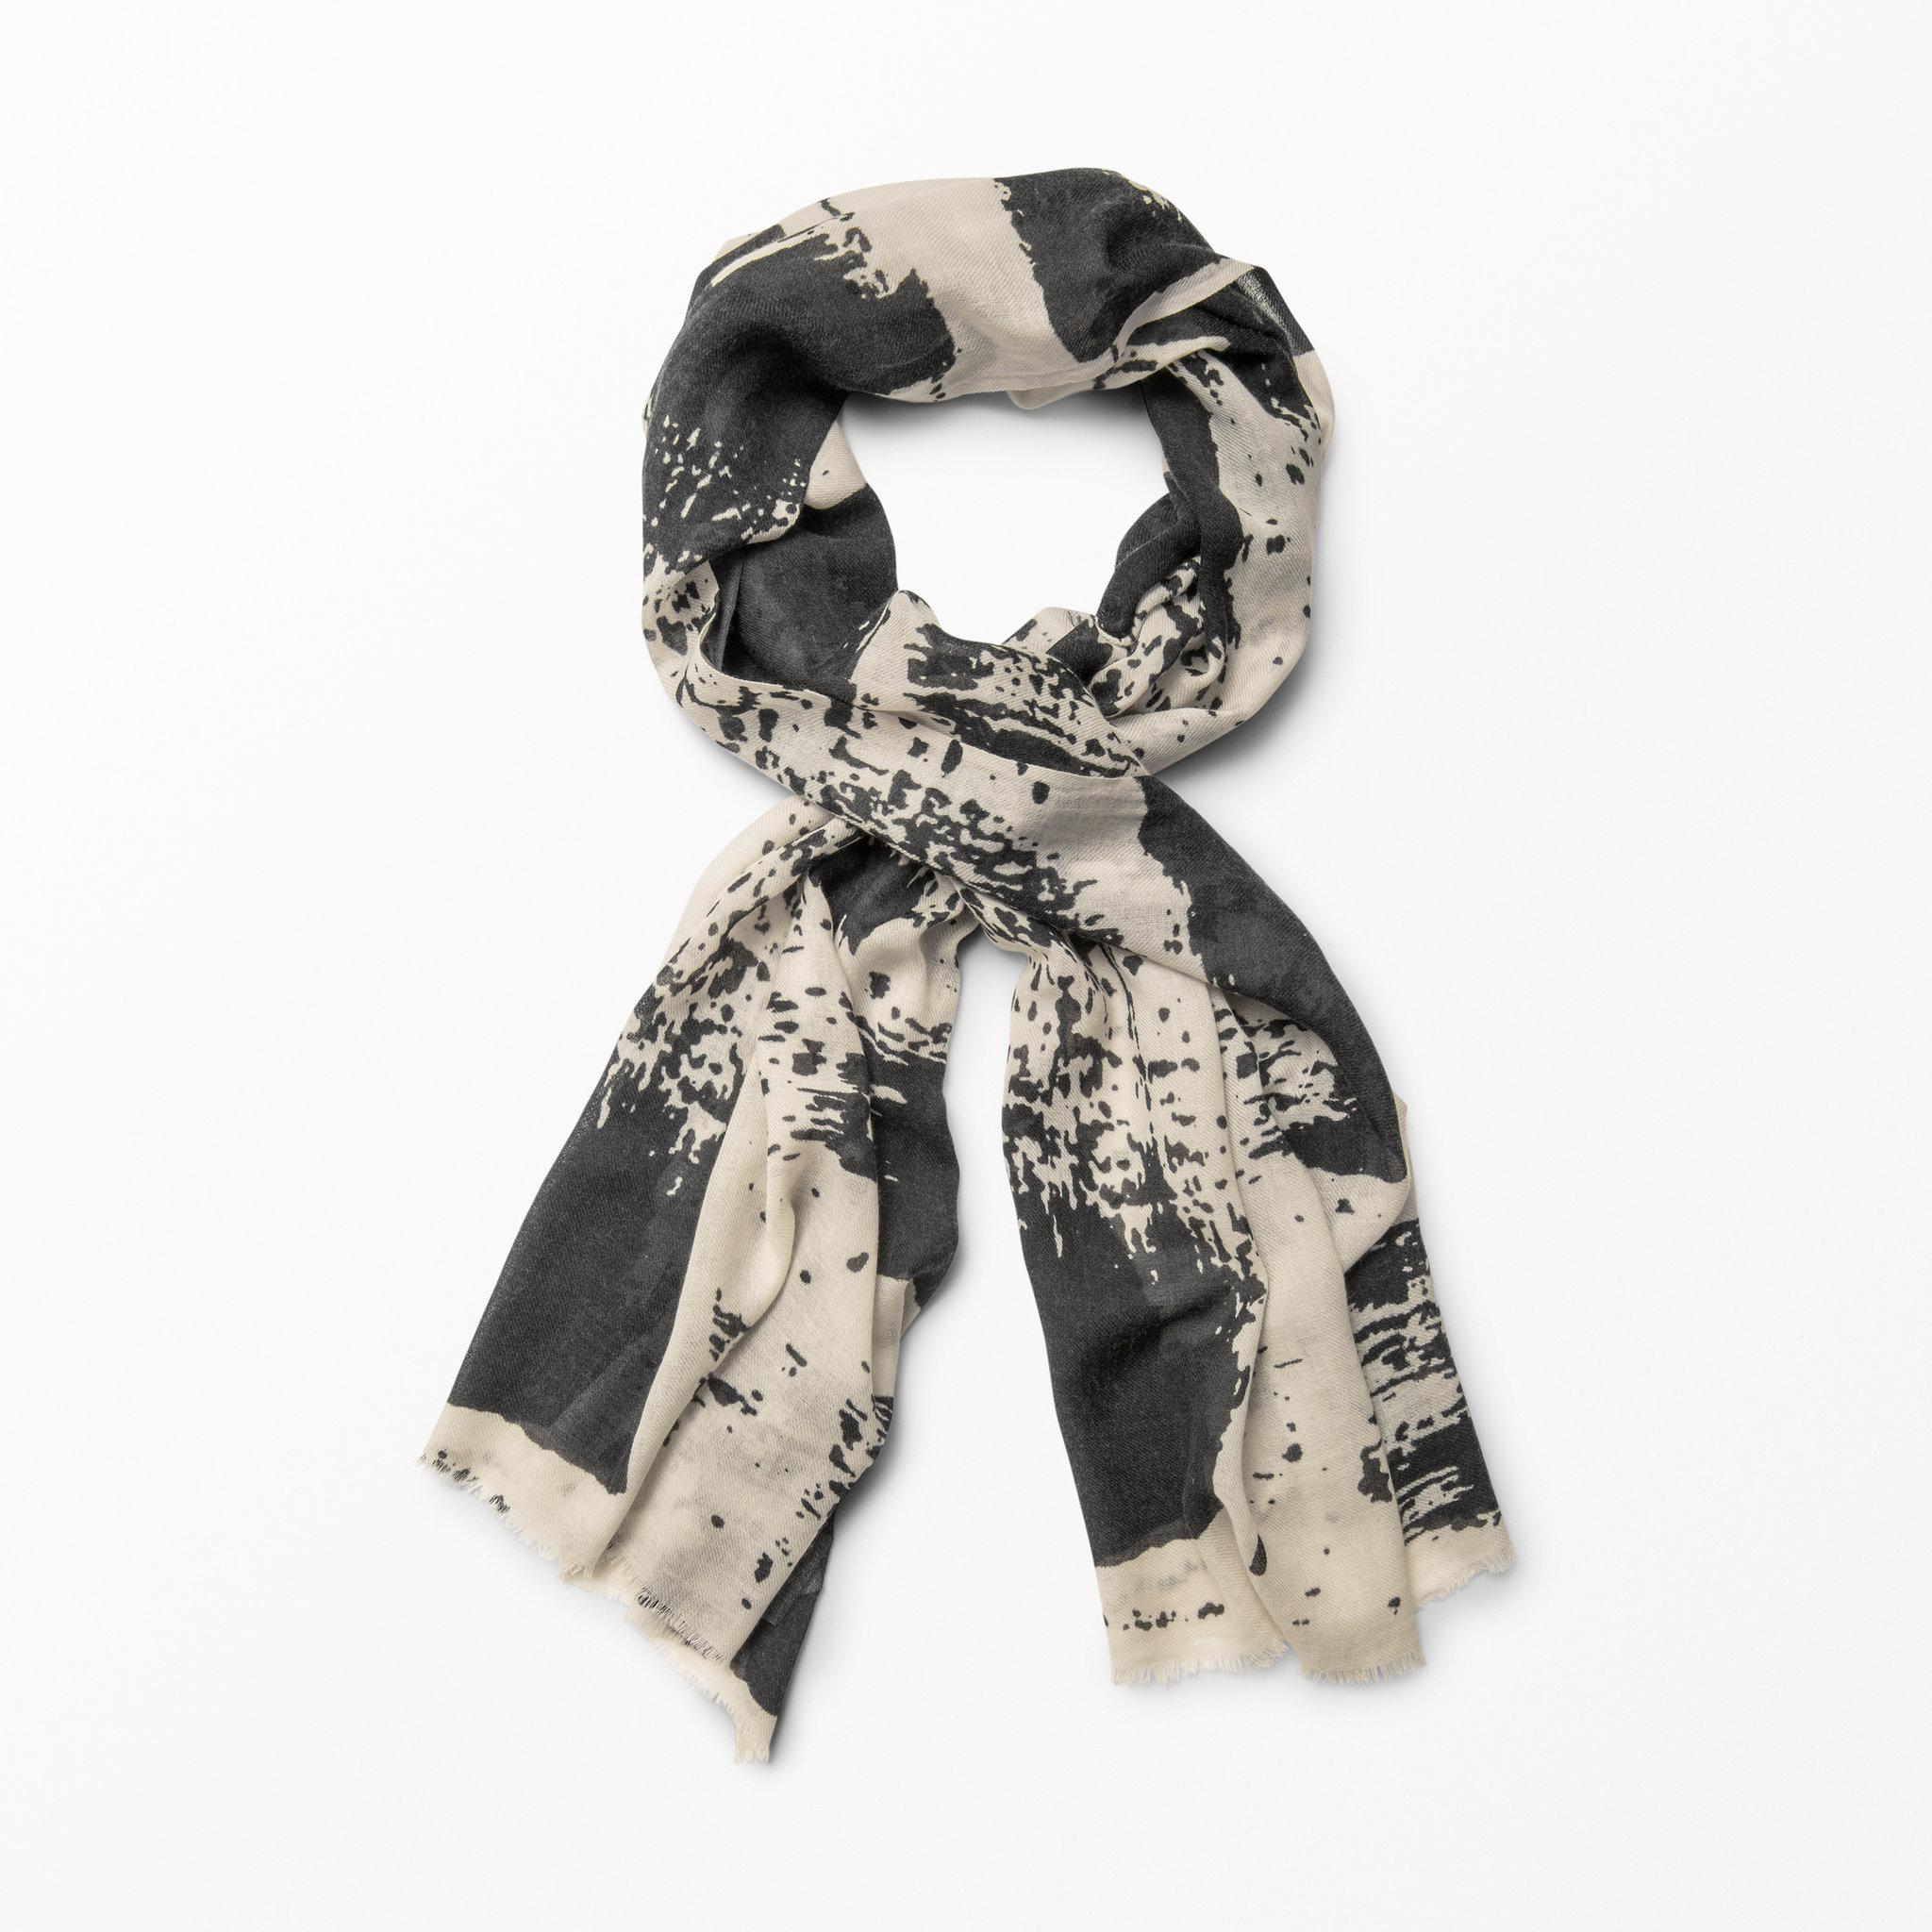 Scarf i kashmir - Halsdukar   scarves - Köp online på åhlens.se! 0ae3bf9b5aee1